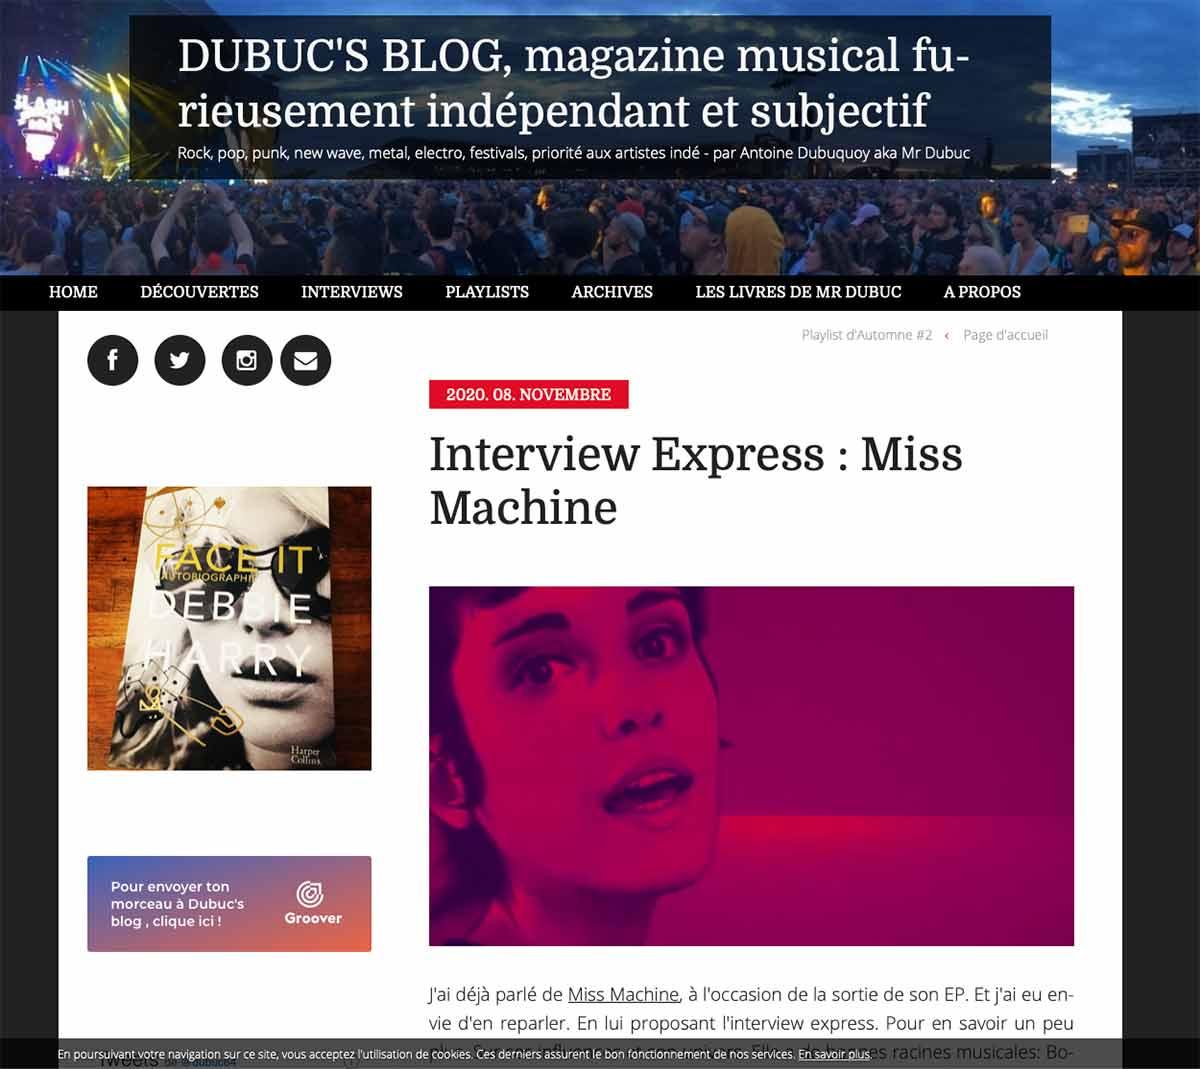 Dubuc's blog interview